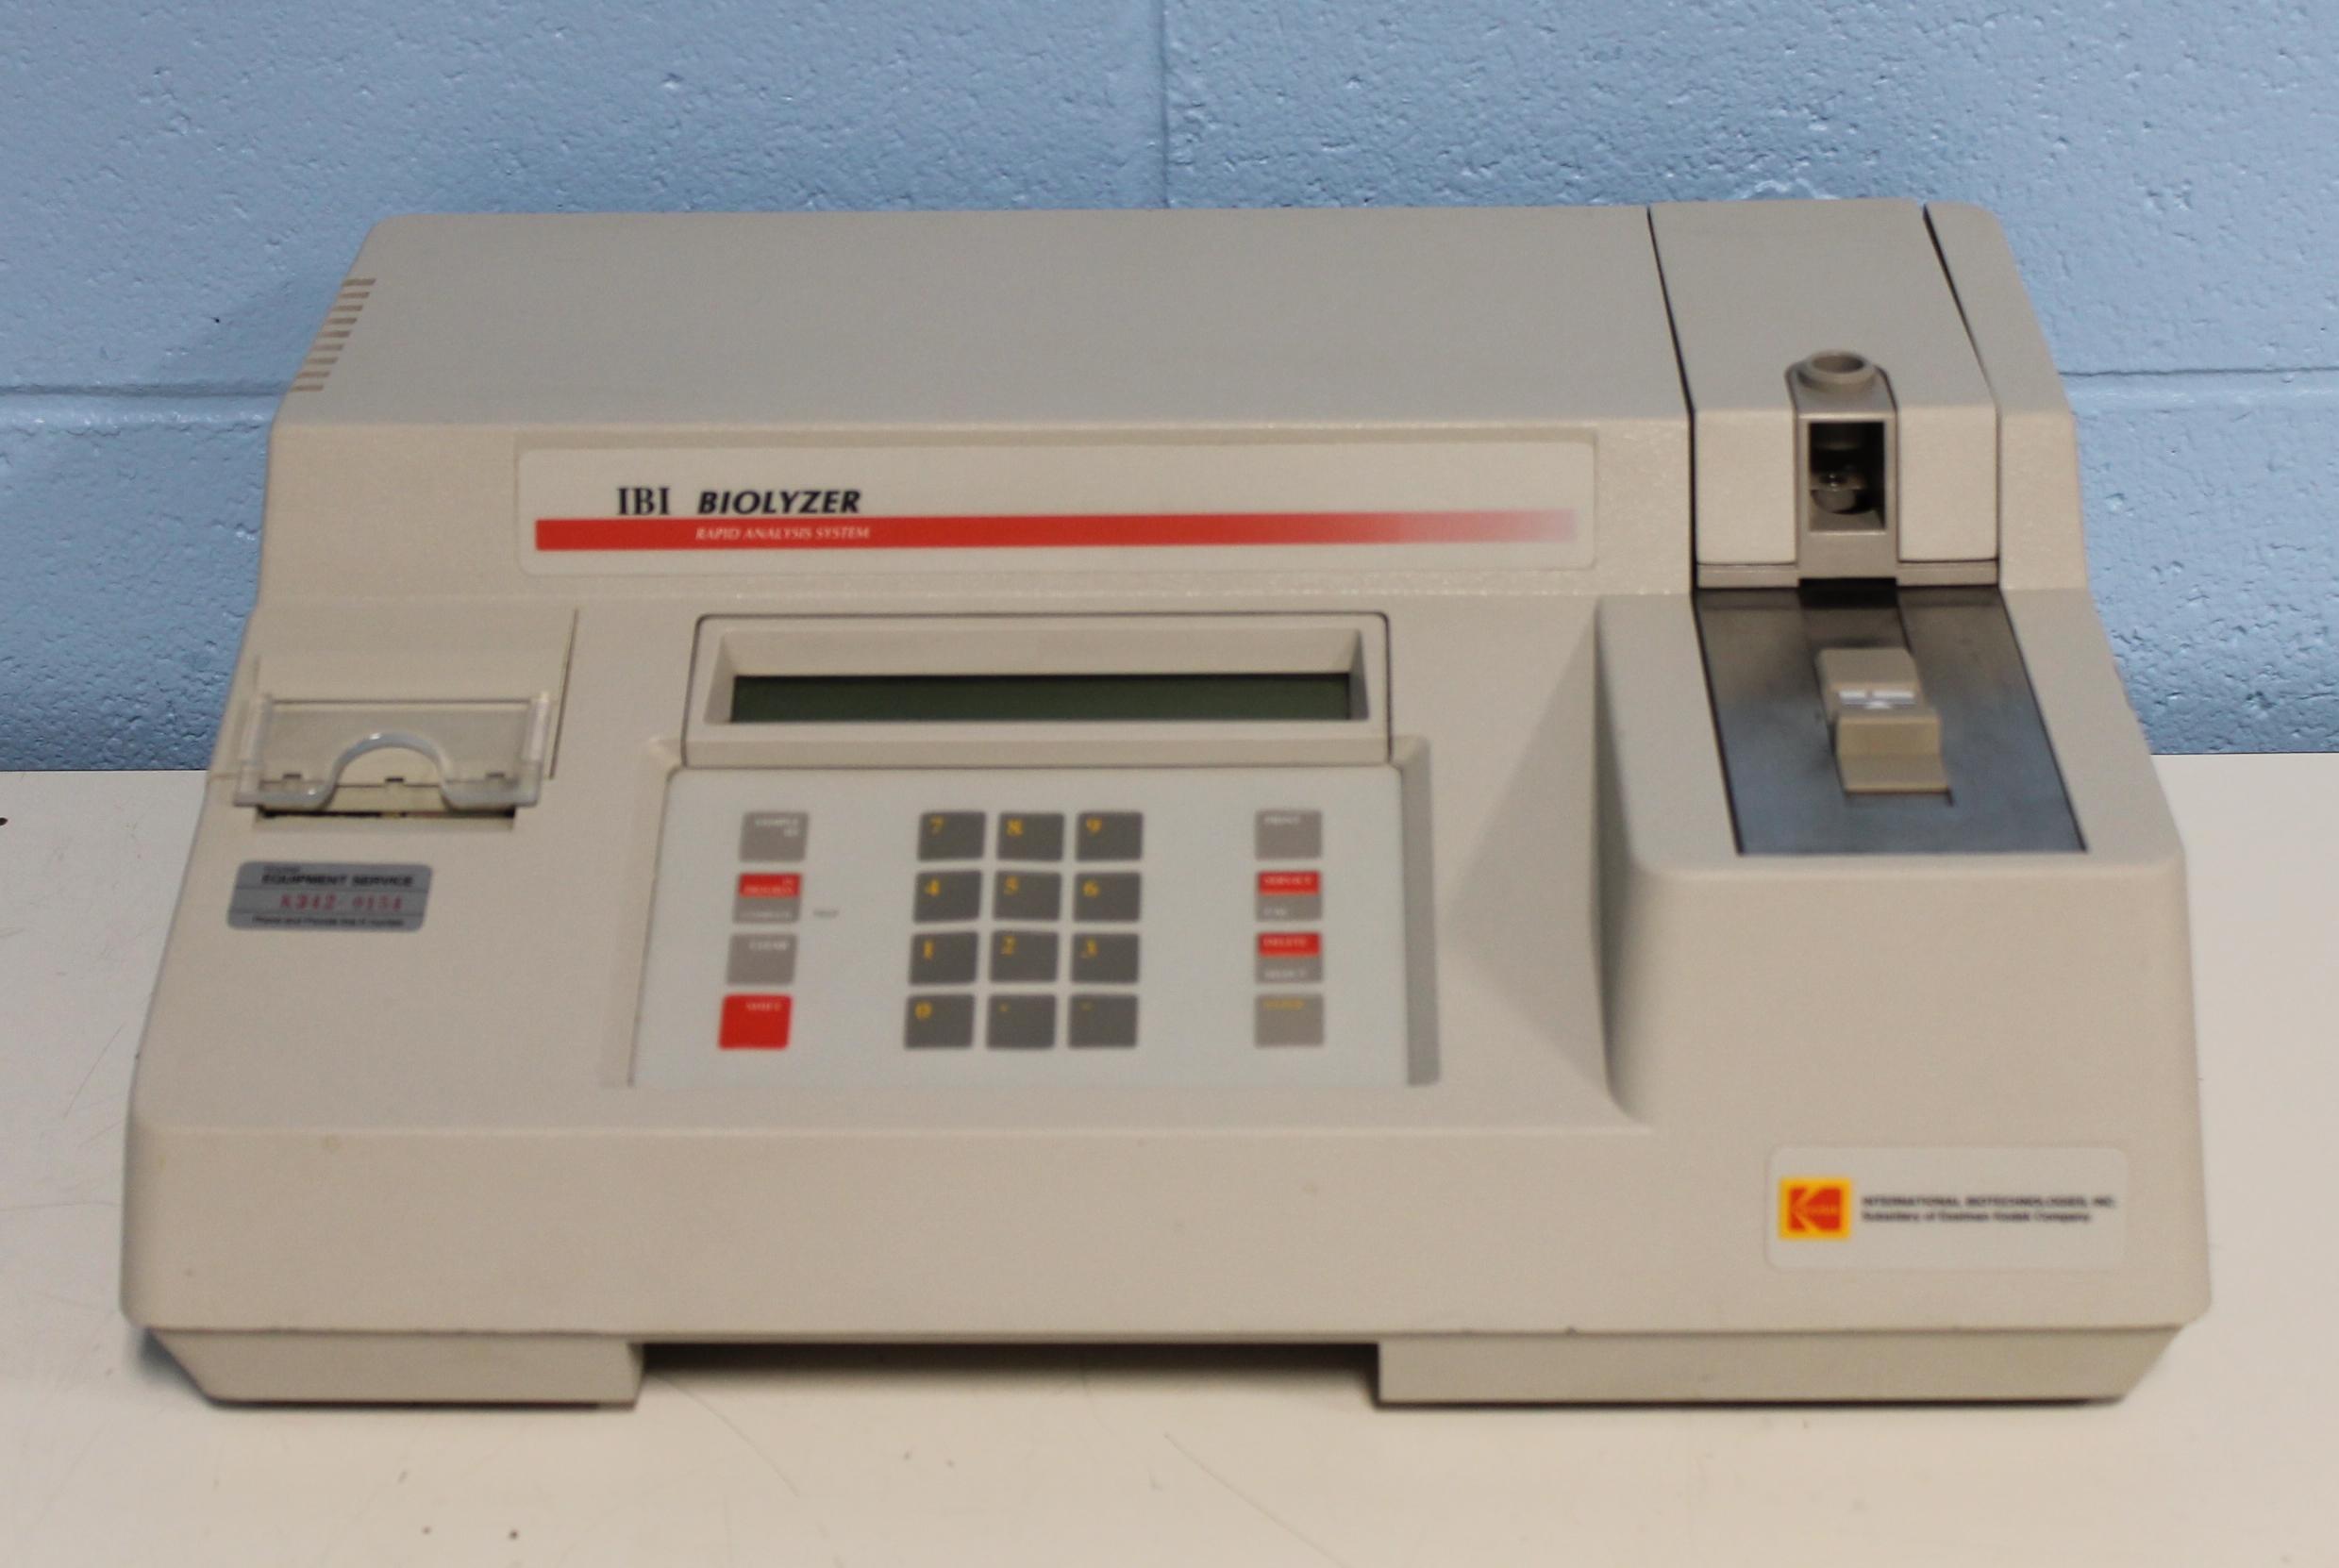 Kodak IBI Biolyzer Kinetic Module Image